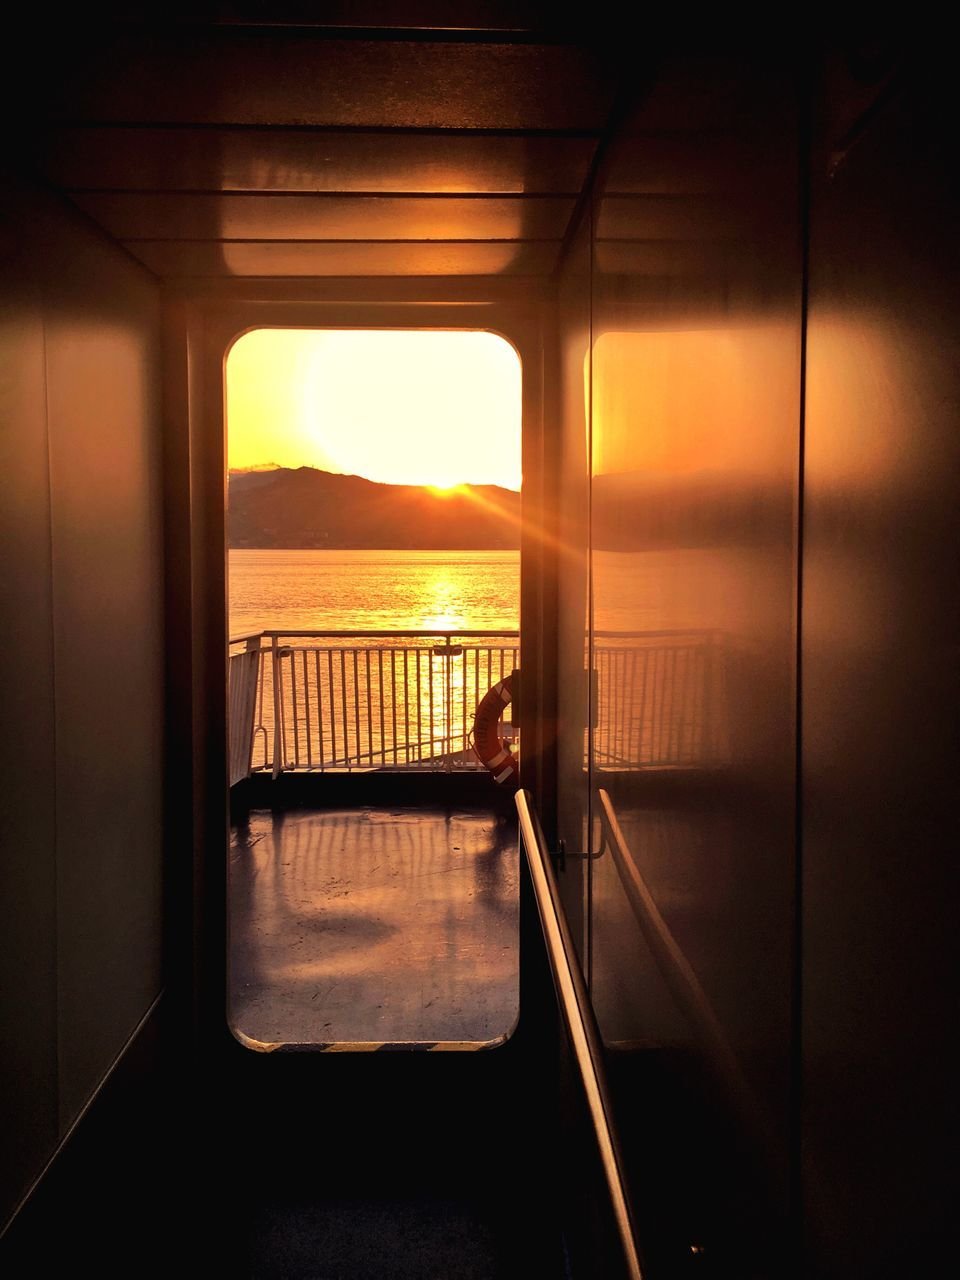 Interior Of A Cruise Ship At Sunset